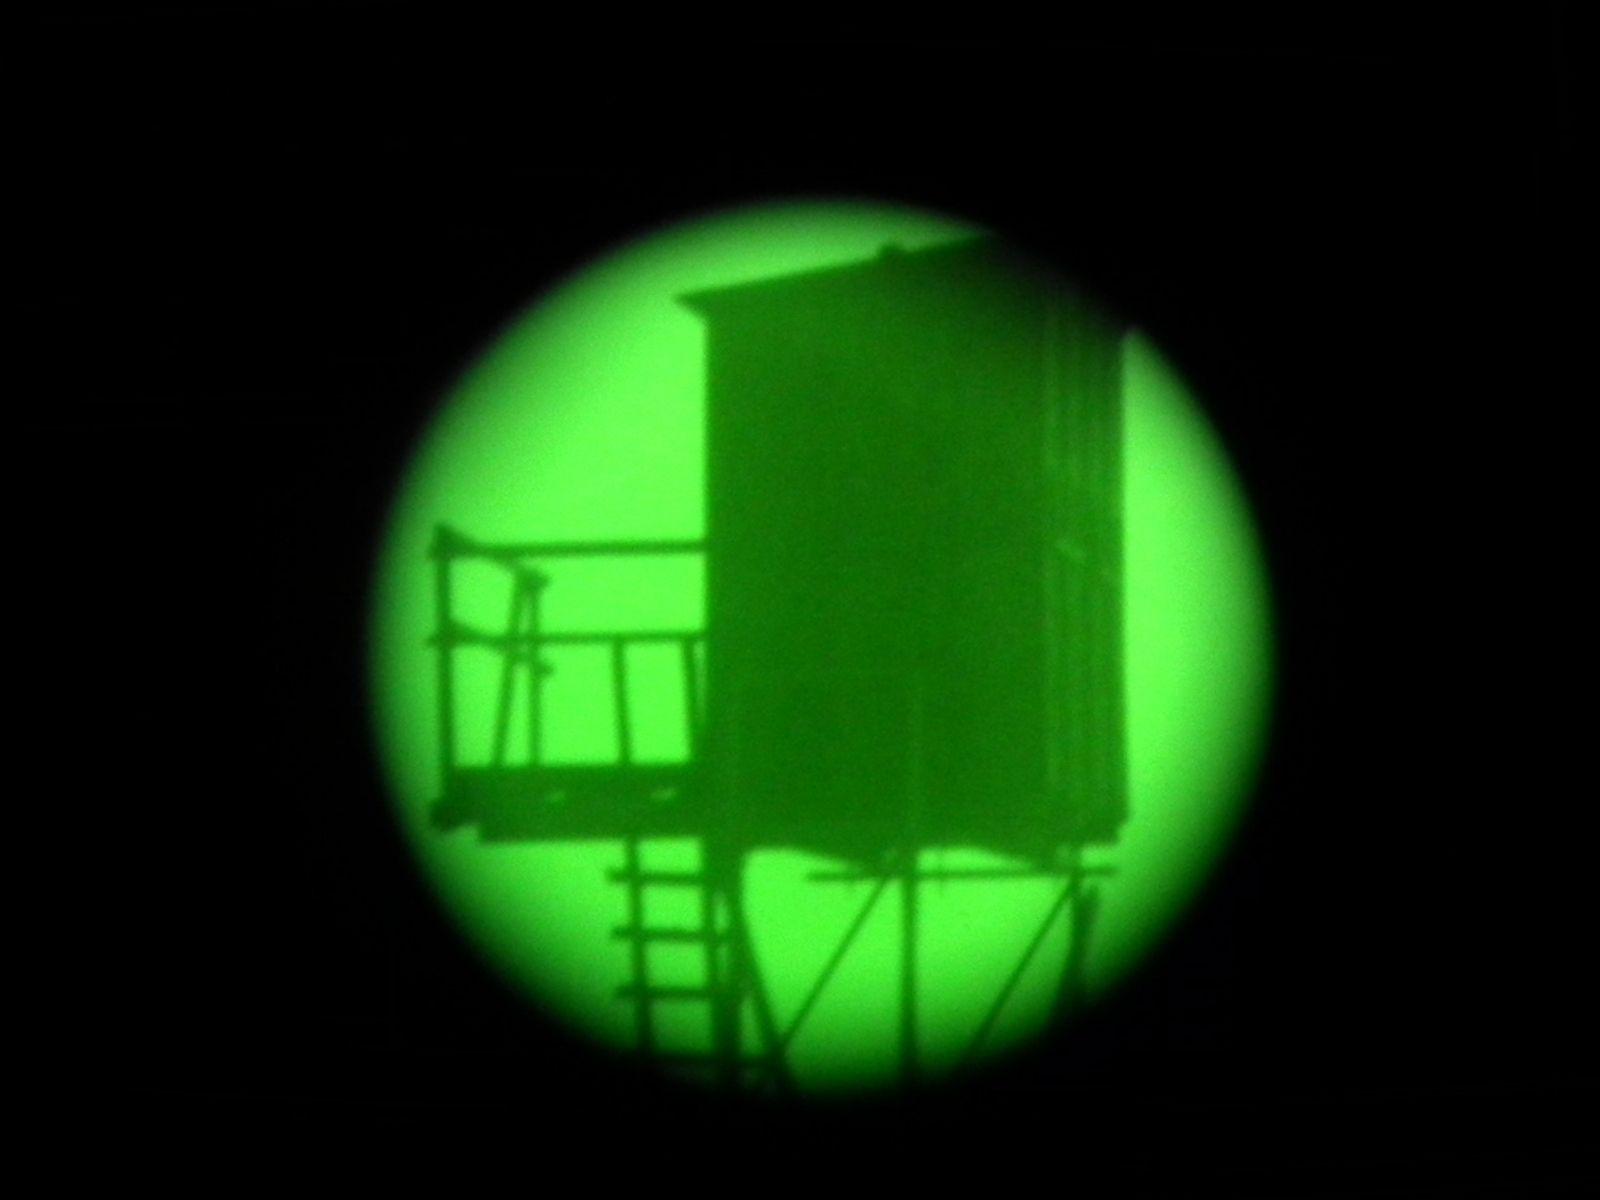 Jagd mit dem nachtsichtgerät dipol dn 34 pro